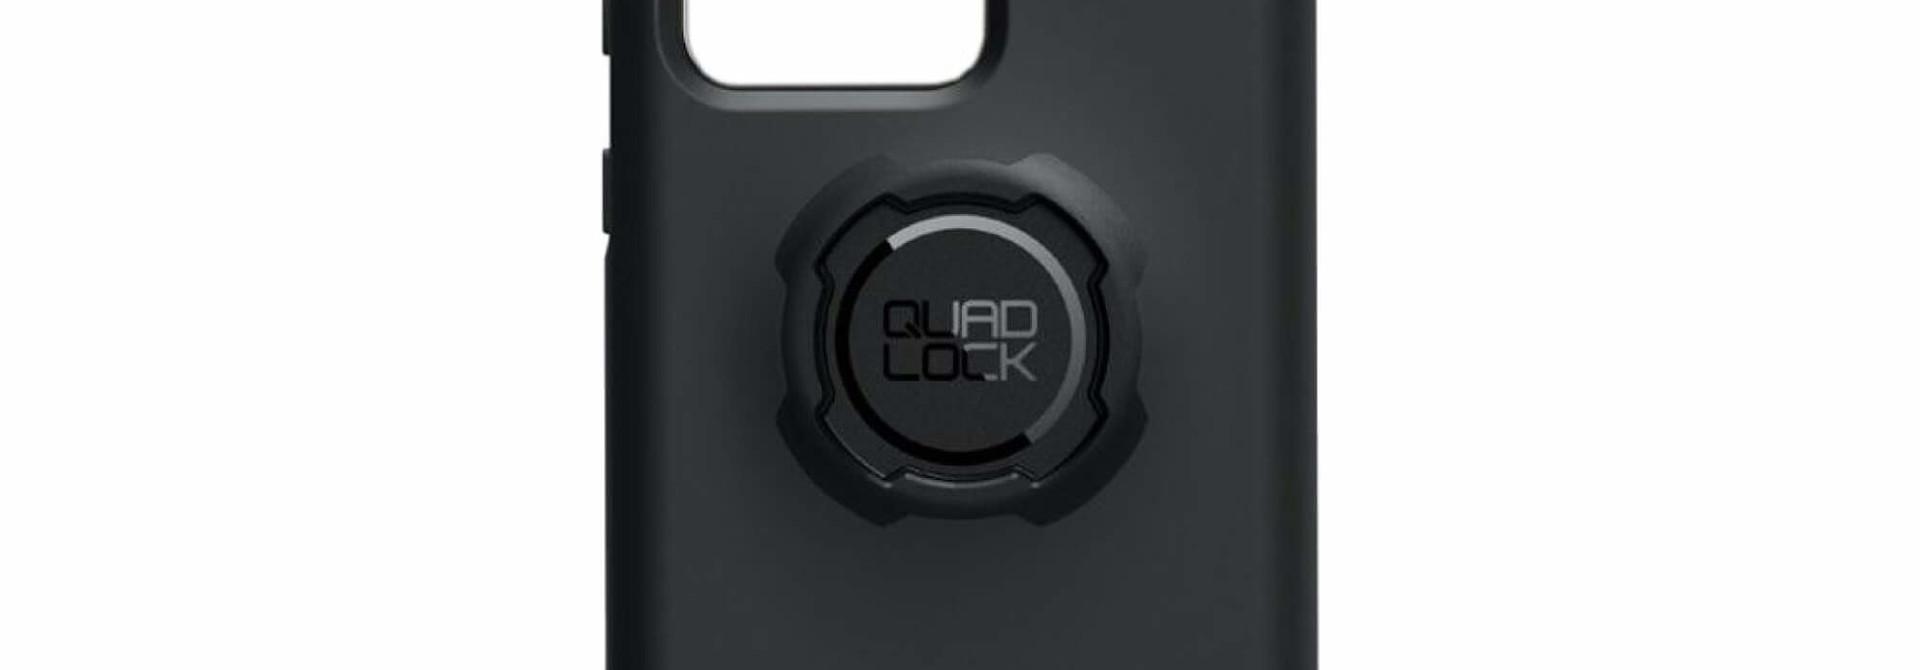 Case Galaxy S20 Ultra Samsung